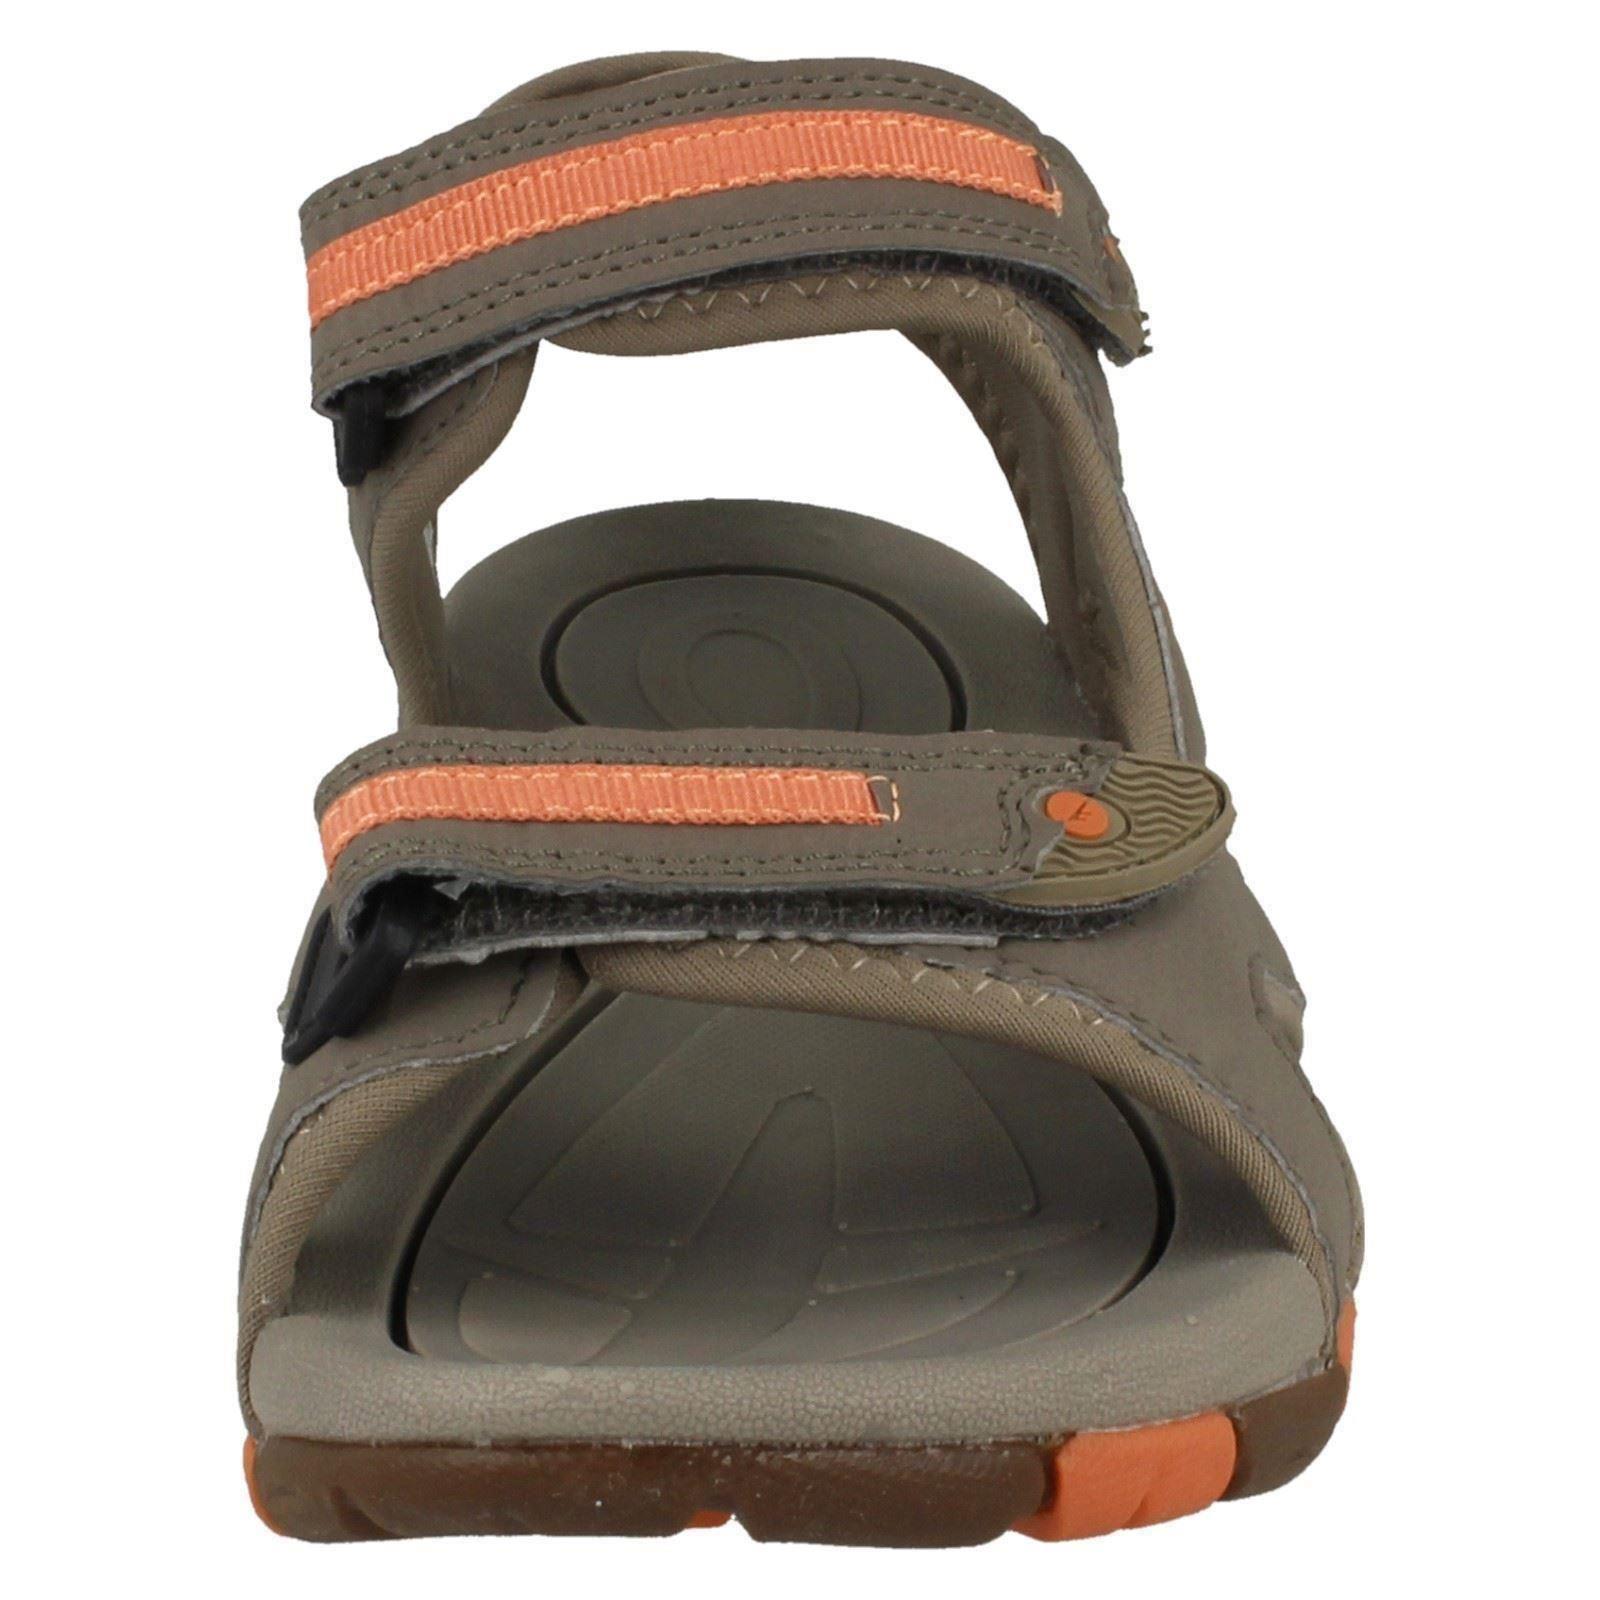 Childrens Hi-Tec Casual Hook And Loop Sandals - GT Strap